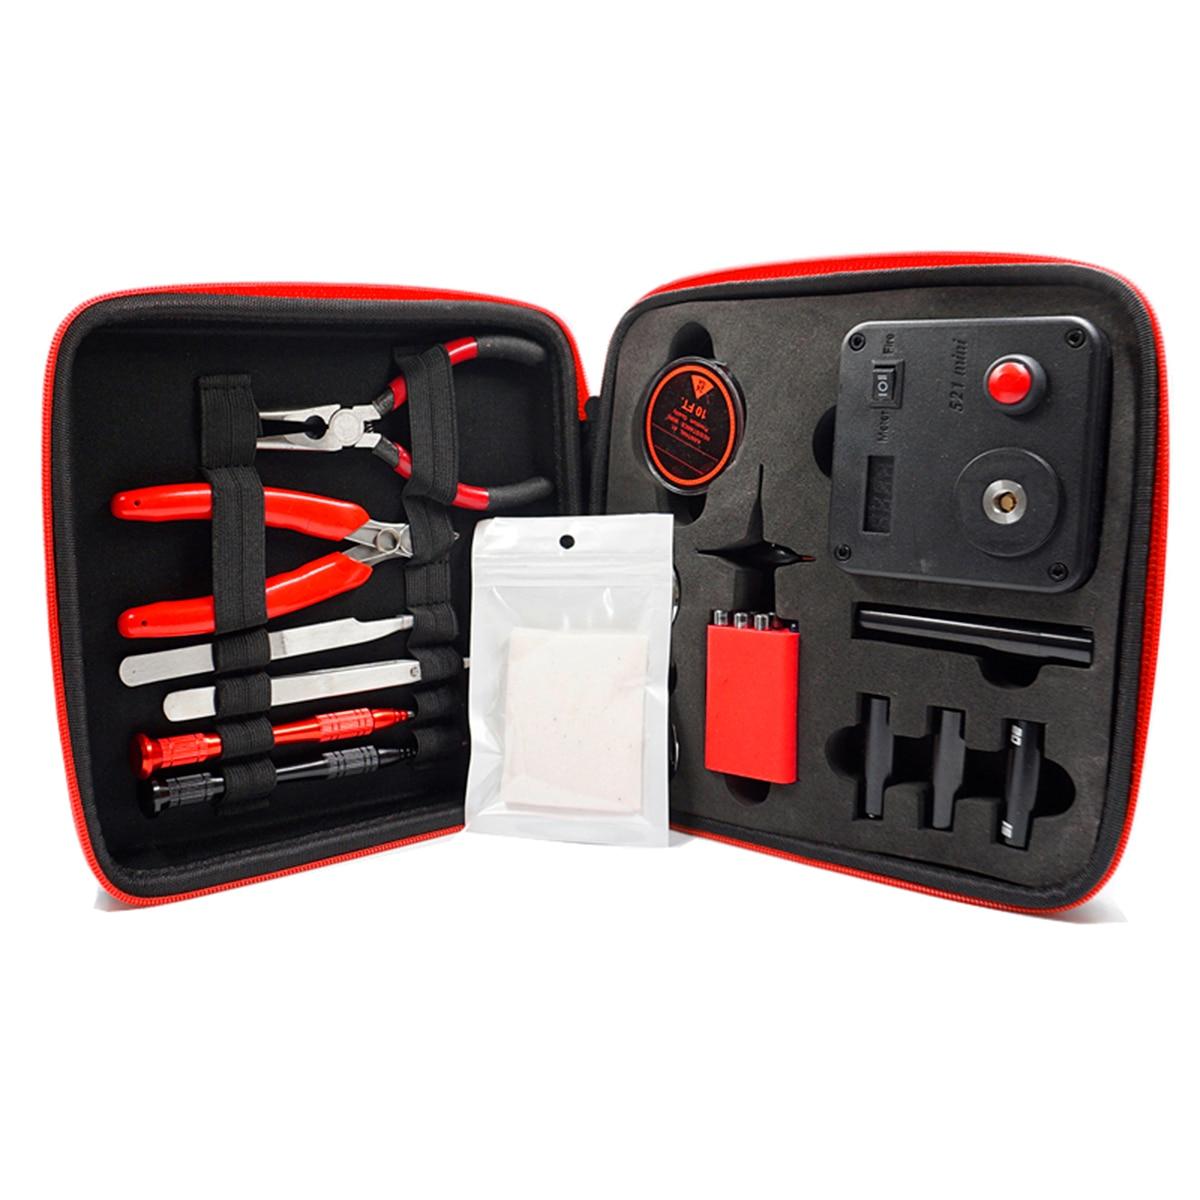 Update Coil Master V3 DIY Kit AllinOne CoilMaster V3+ Electronic Cigarette RDAtomizer coil tool bag Accessories Vape